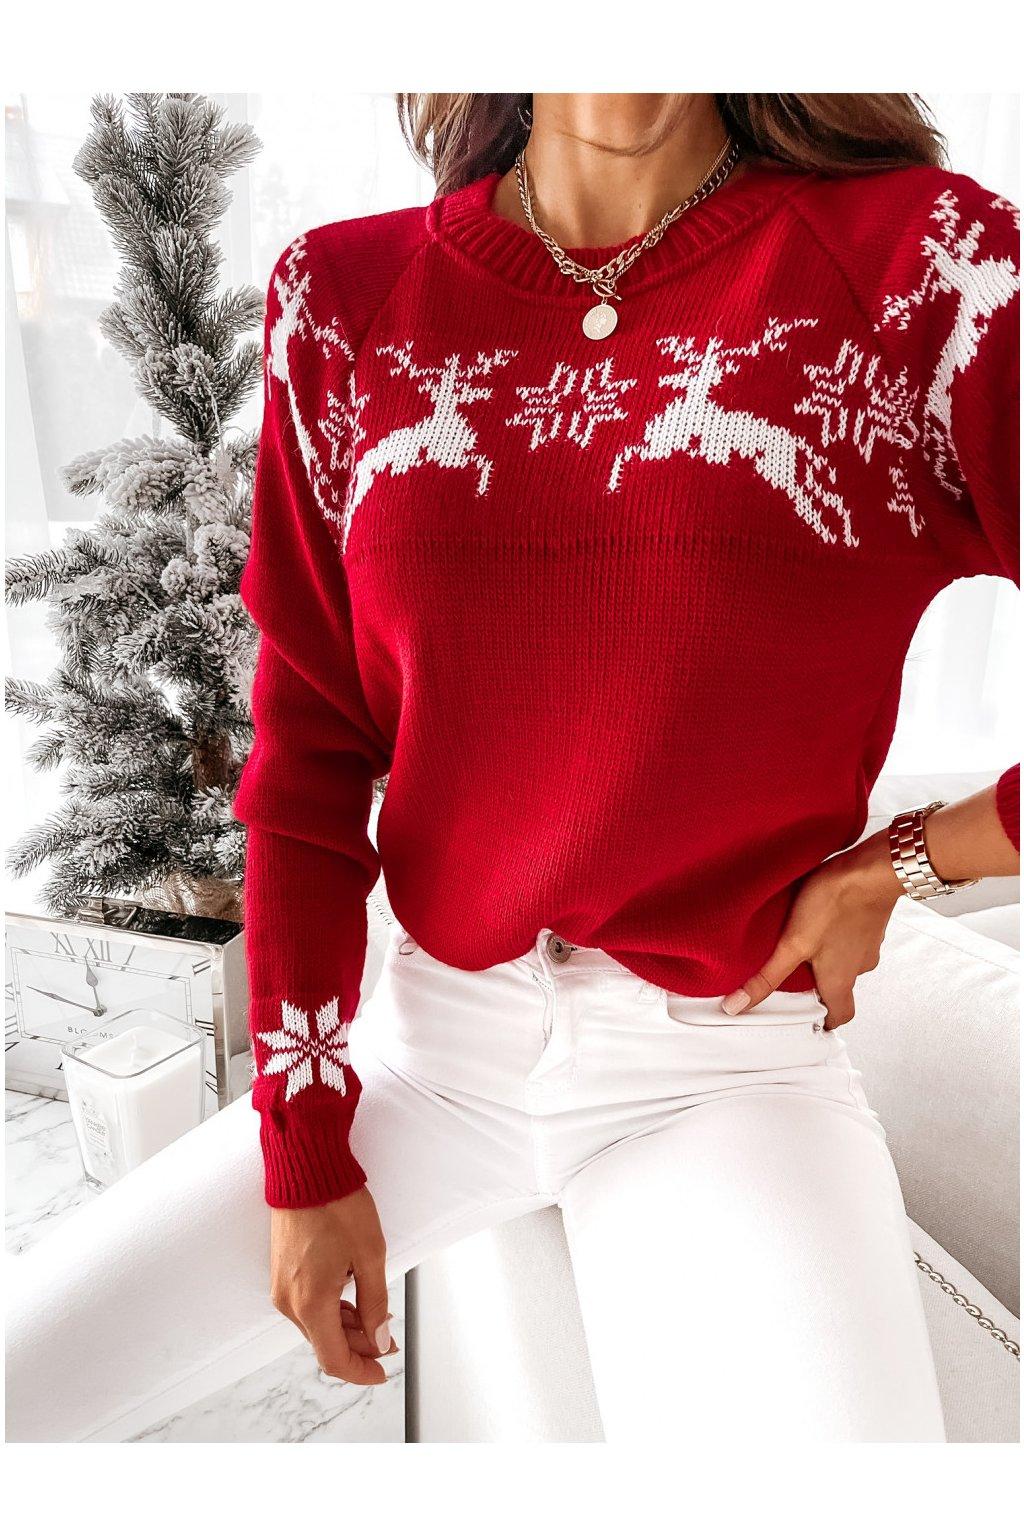 damsky svetr christmas reindeer red eshopat cz 1